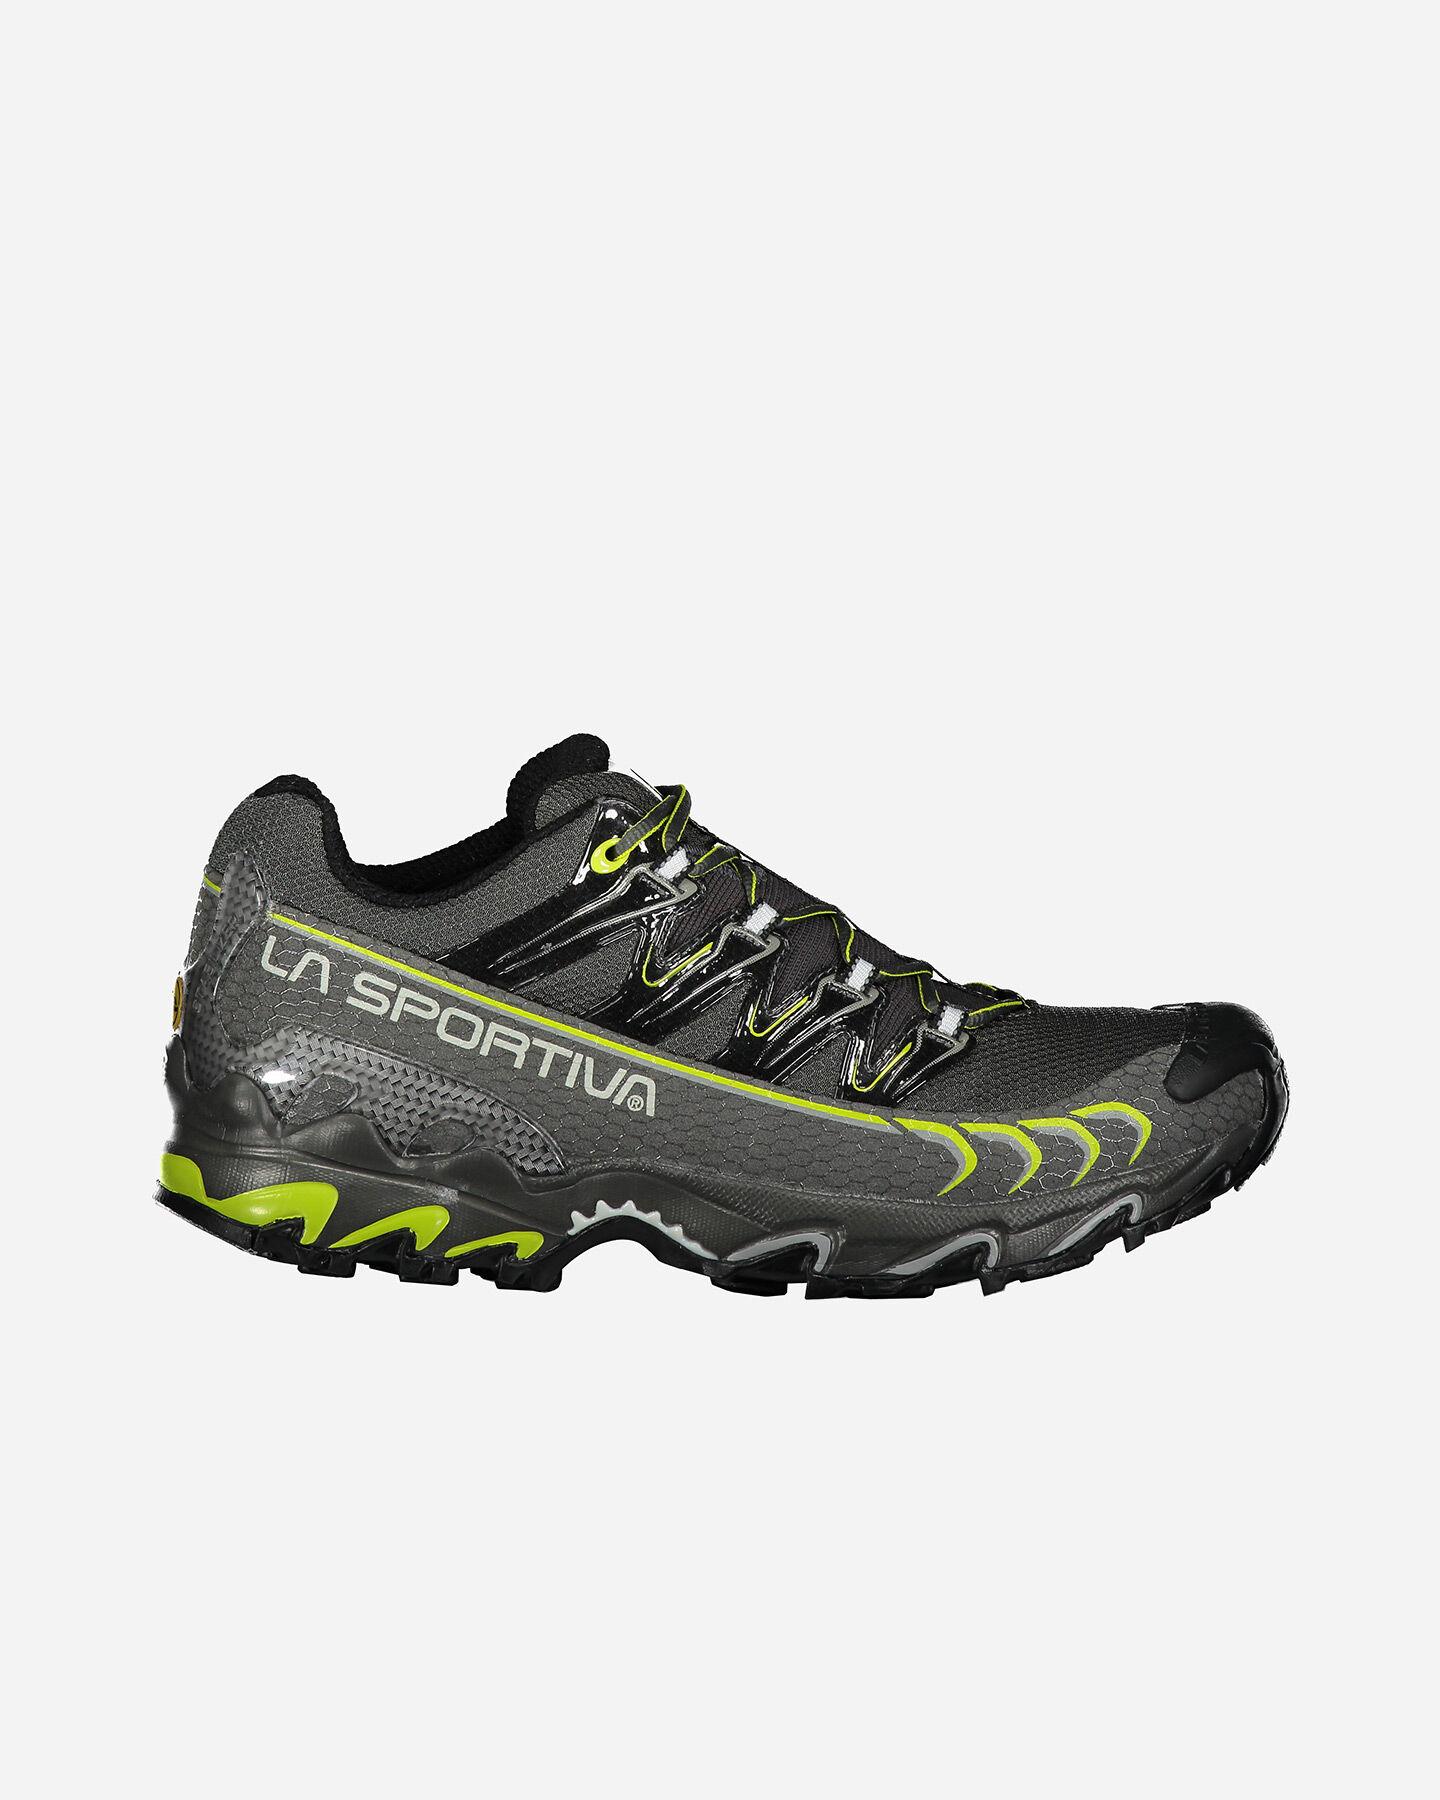 Scarpe Trekking La Sportiva Tx5 Gtx M 27I805707   Cisalfa Sport